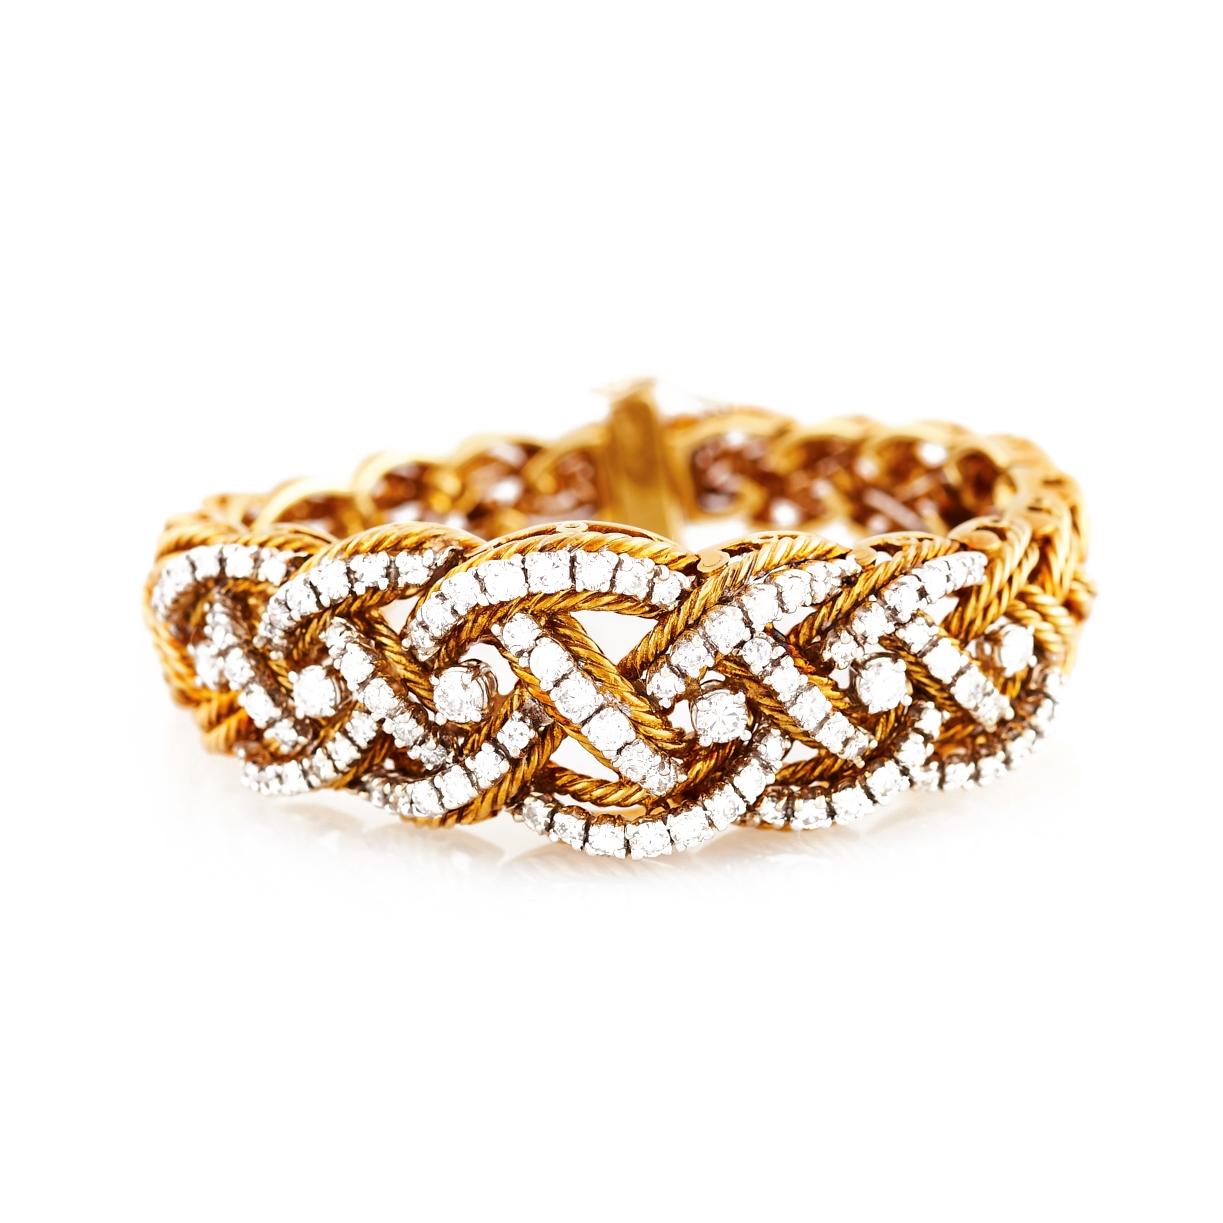 Hammerman Bros. Gold Diamond and Gold Bracelet